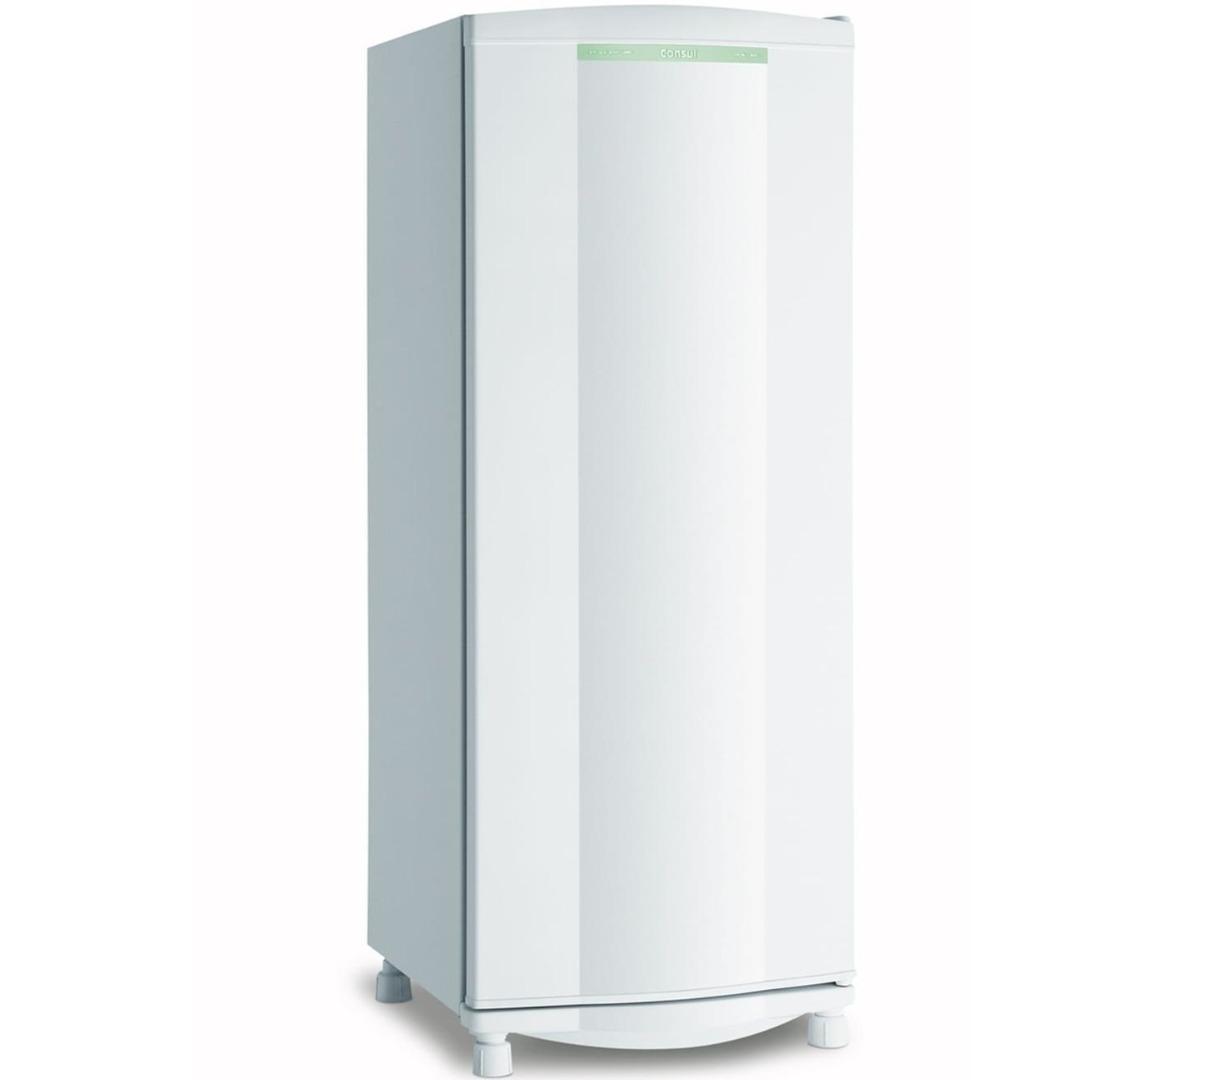 Refrigerador 1P 261 Litros - Consul - Branco - 220 Volts